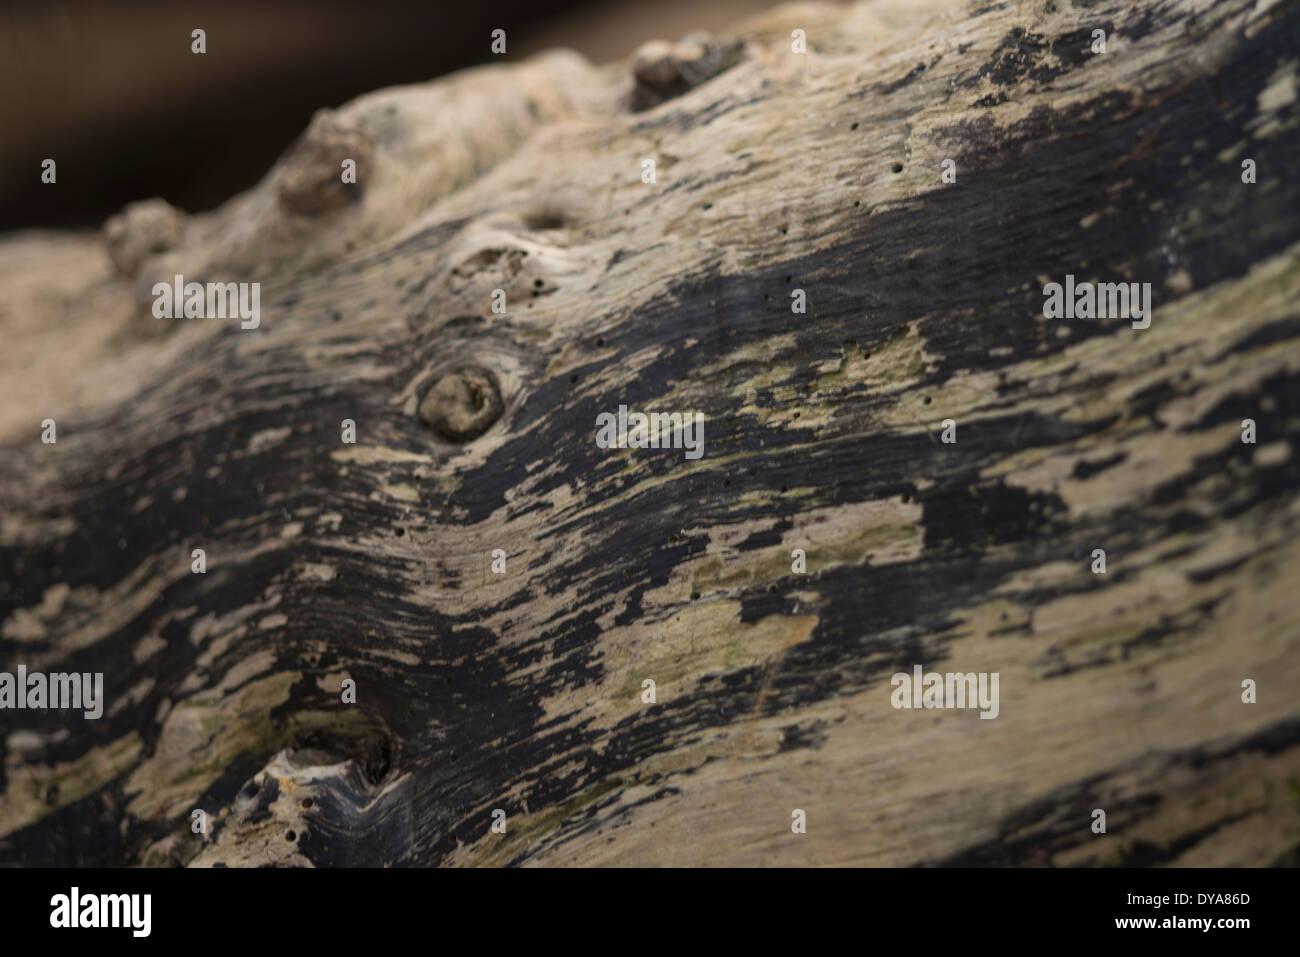 Close up of tree bark, burnt tree, texture, colour photograph, - Stock Image